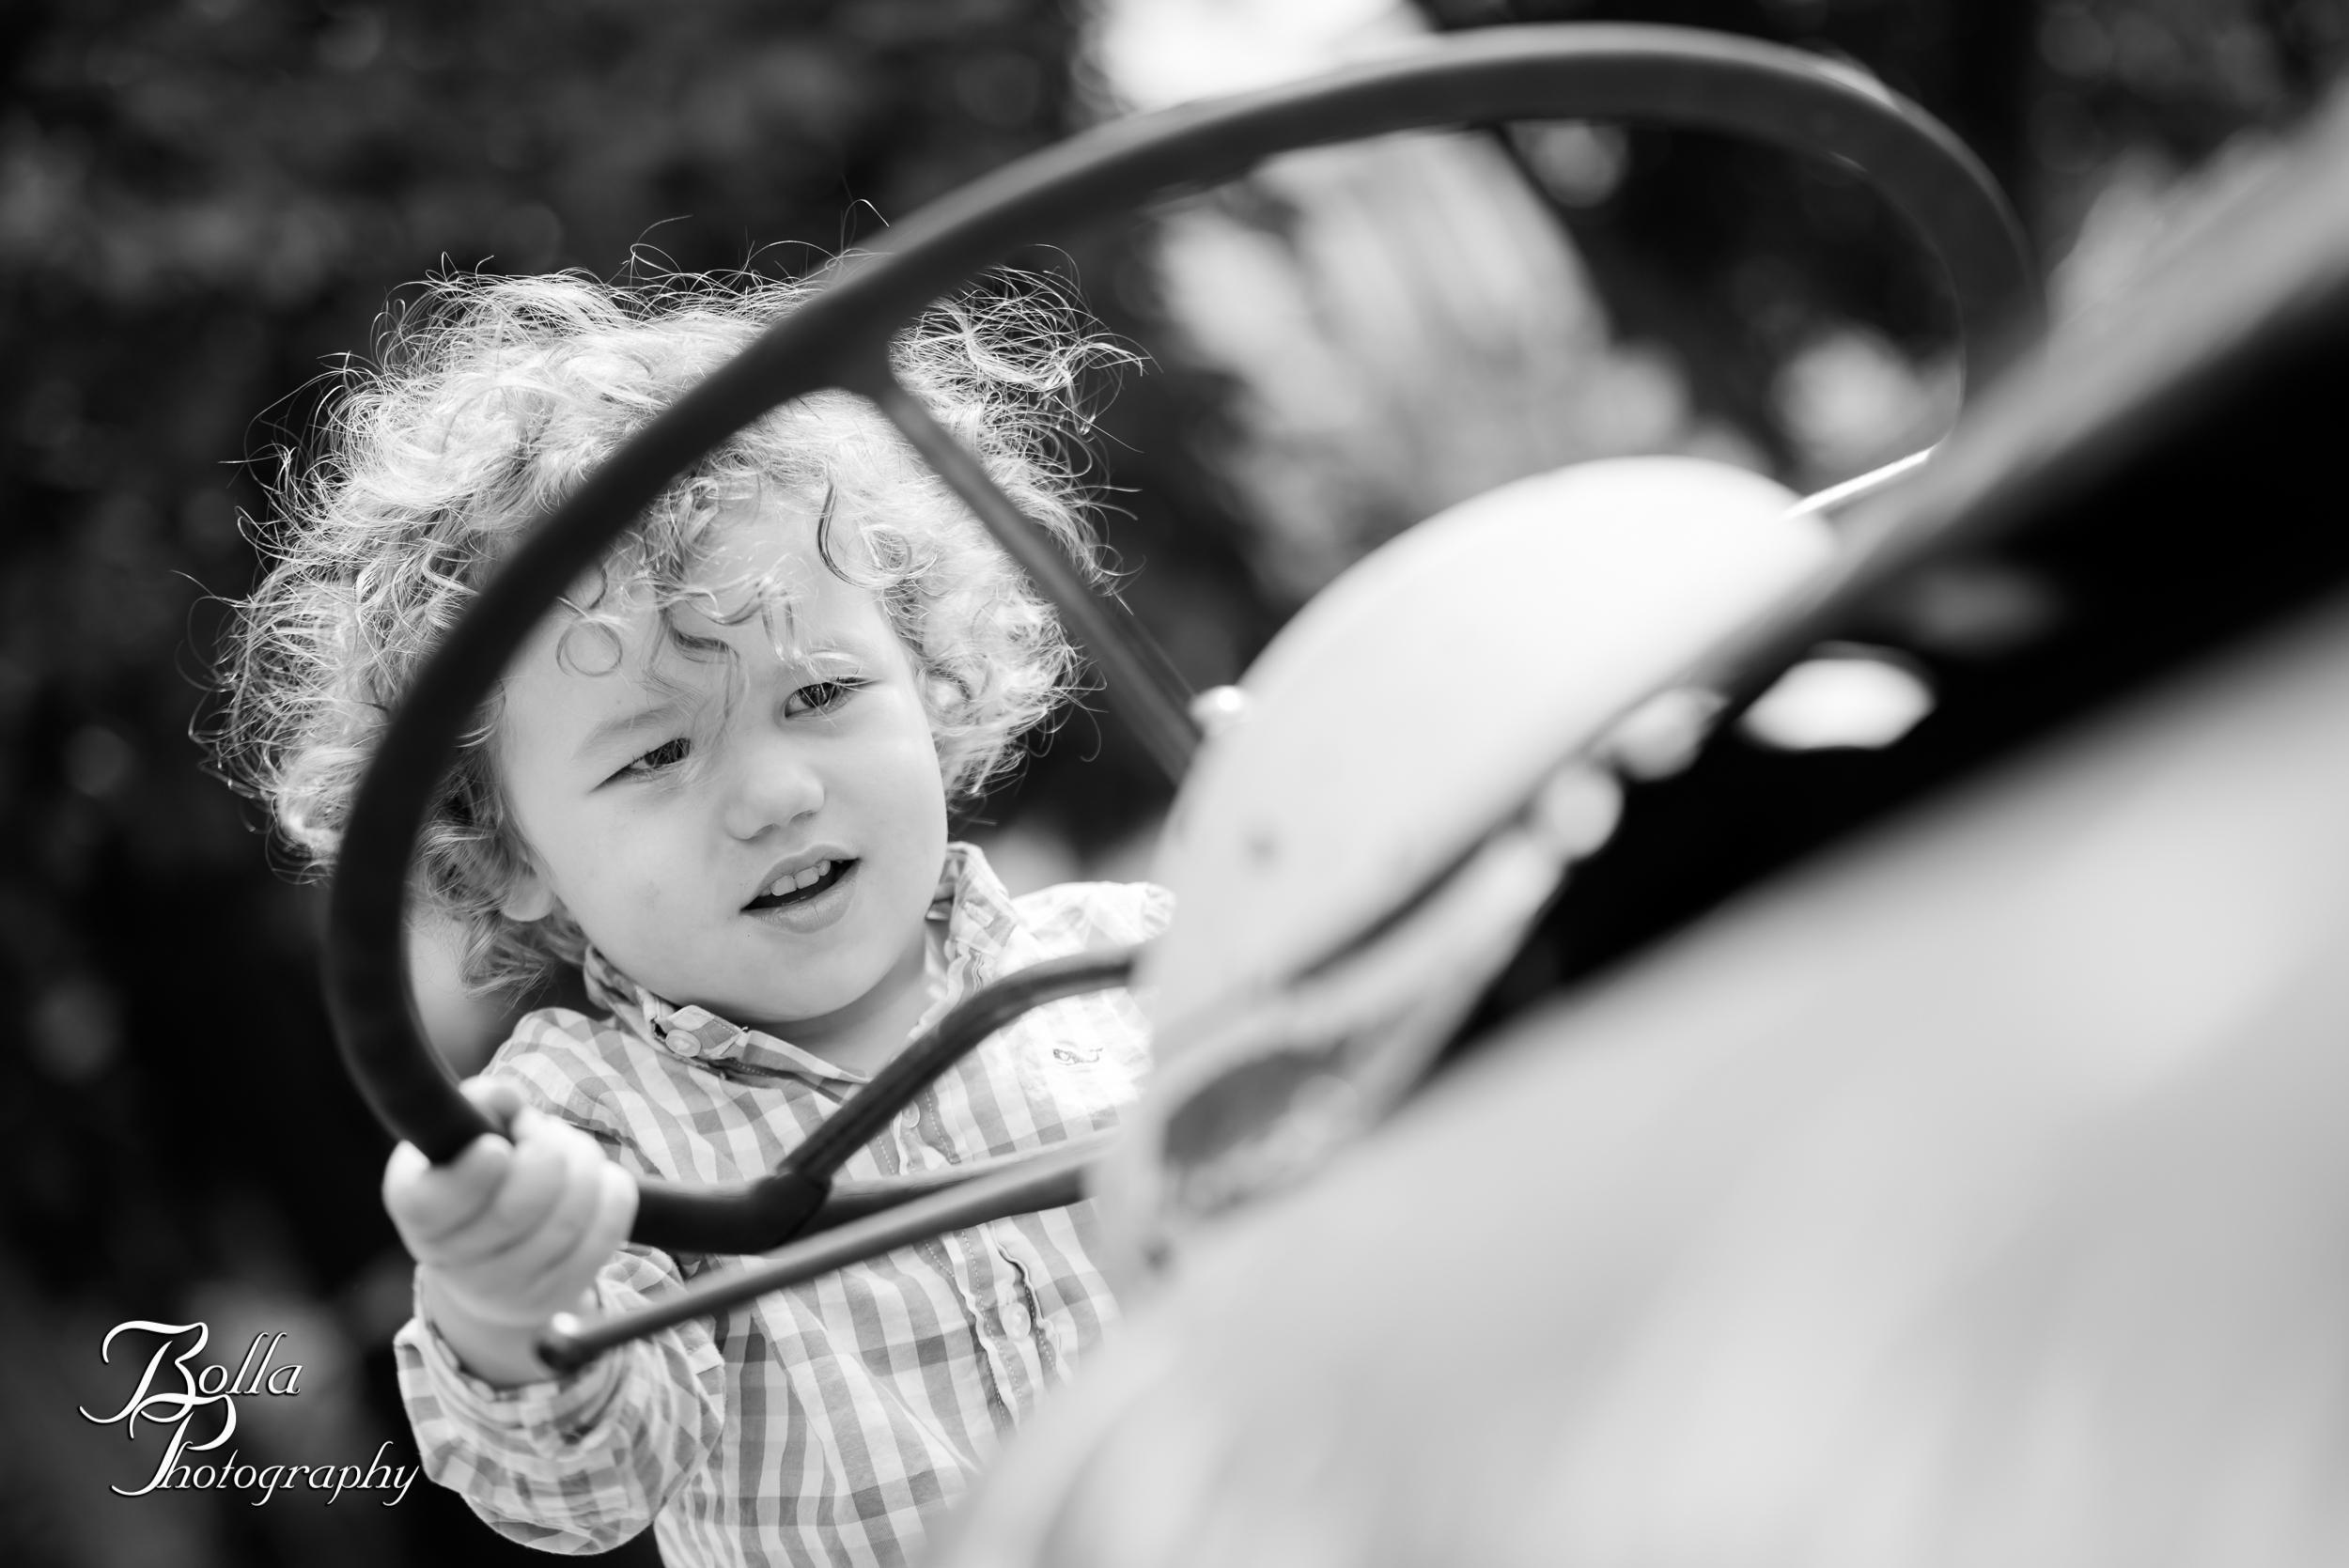 20170805_Bolla photography edwardsville wedding newborn baby photographer st louis weddings babies-2-3.jpg